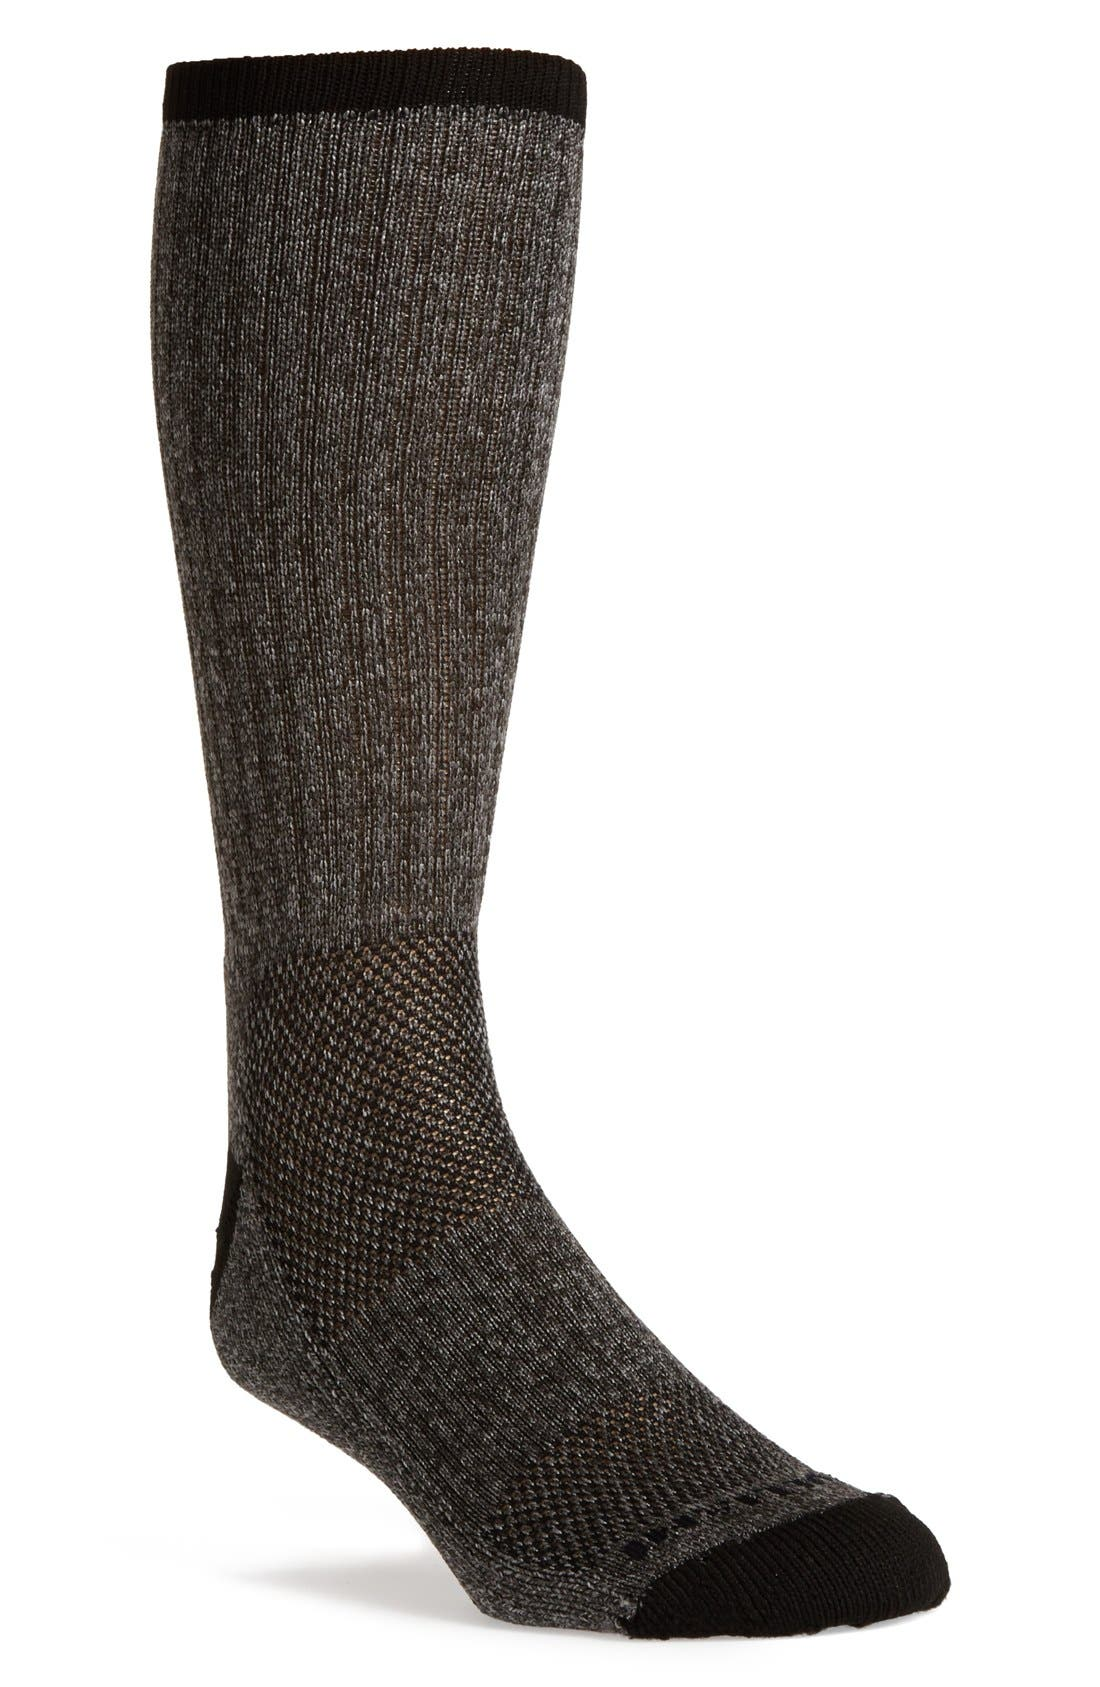 Main Image - Remo Tulliani 'Taos' Socks